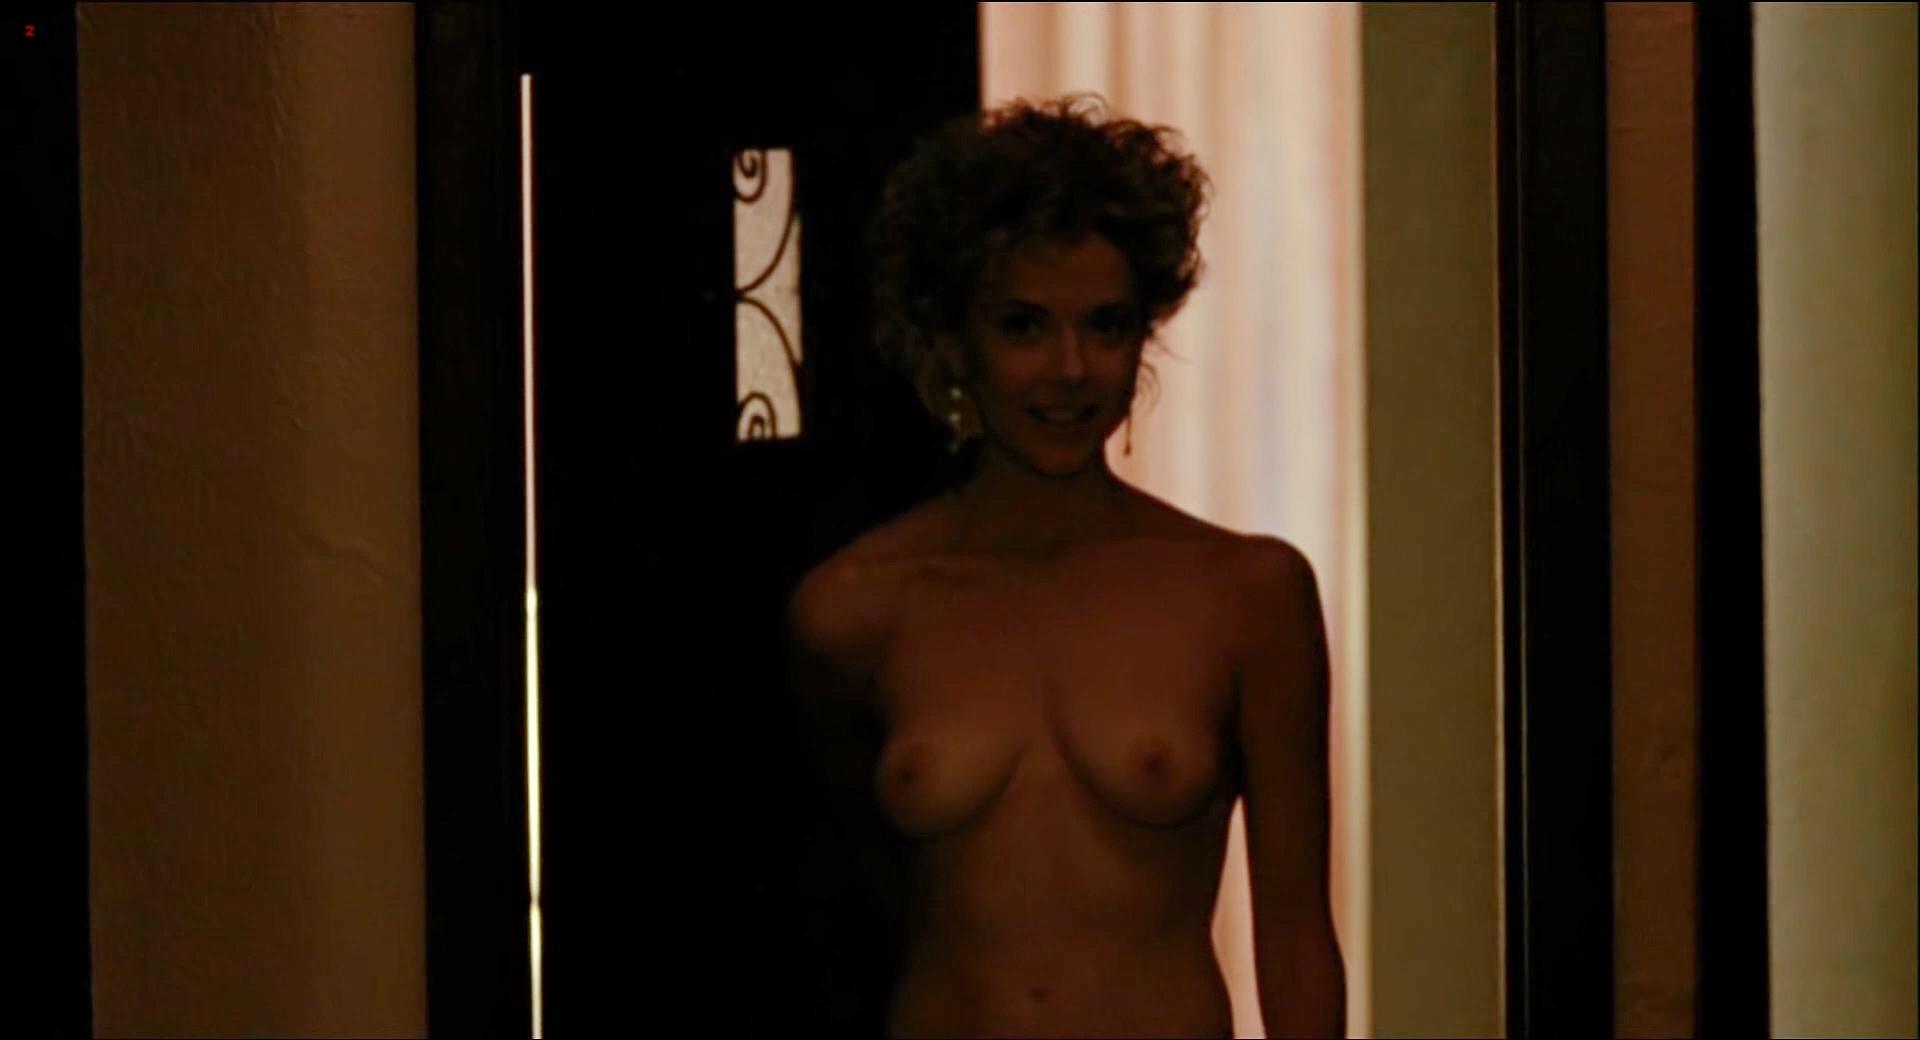 from Coleman nancy travis nude bondage